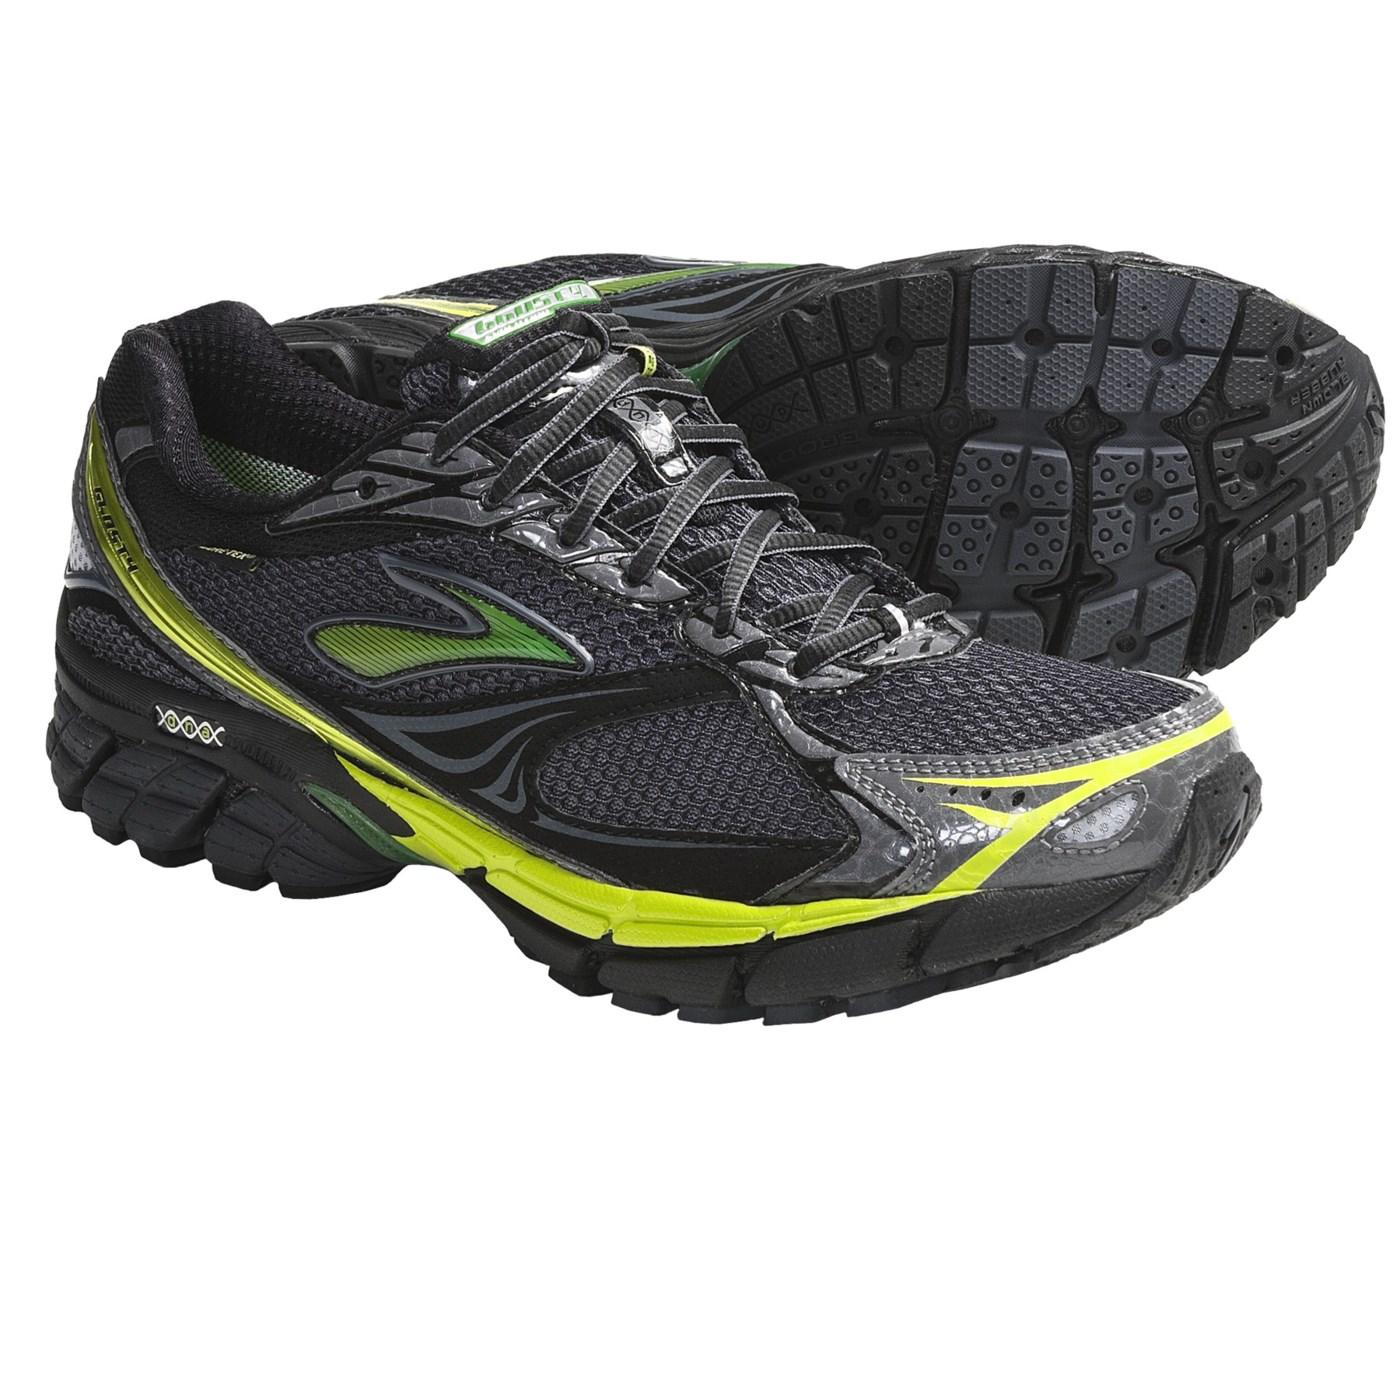 brooks shoes types colorful soccor brooks shoes size 480x360 67k